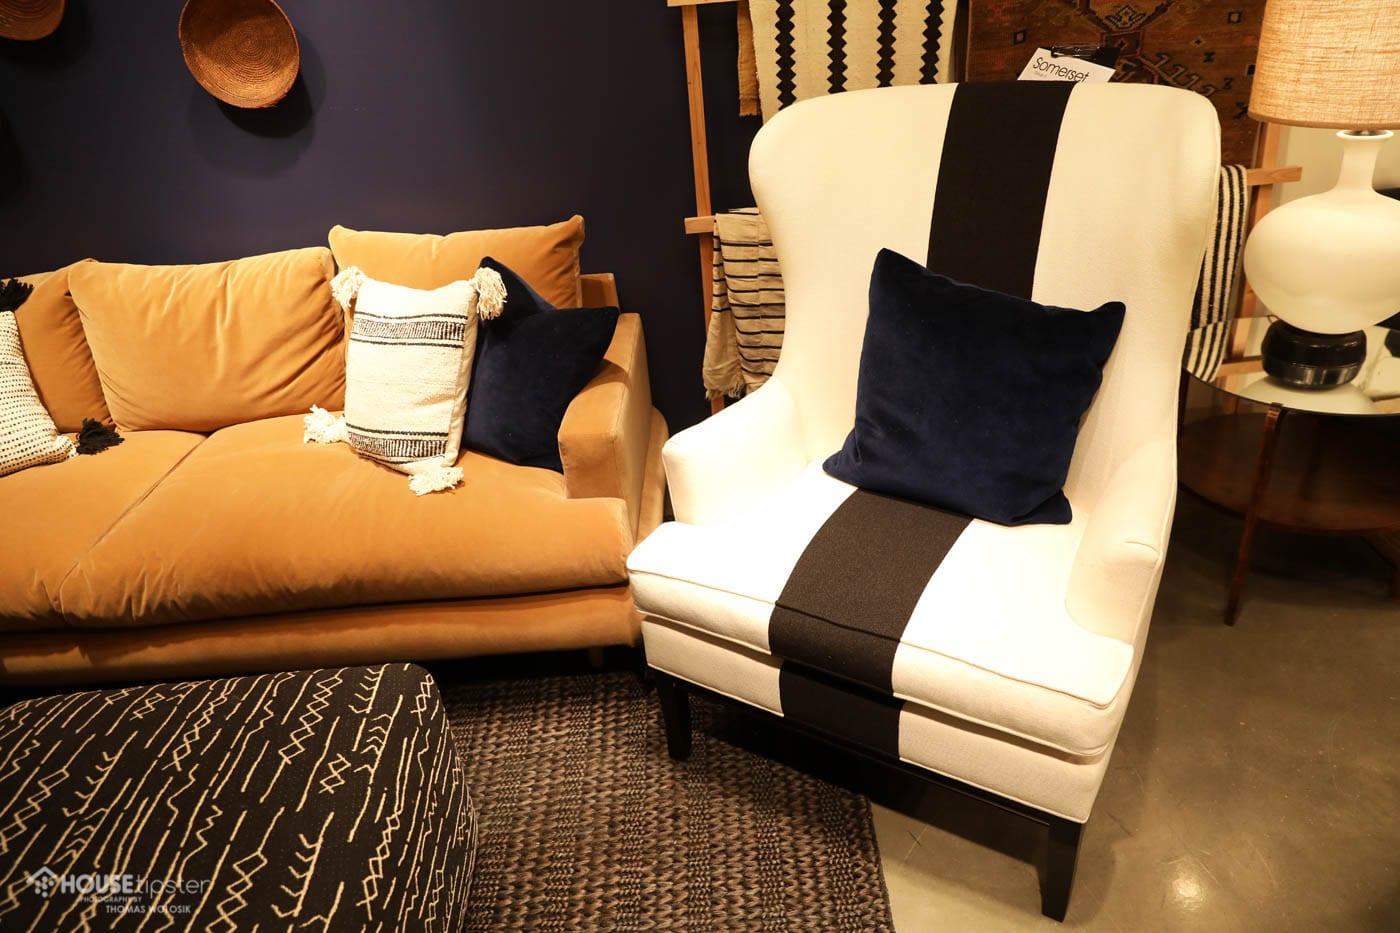 Magnificent Kim Salmela Brings Texture And Taste To Her Norwalk Forskolin Free Trial Chair Design Images Forskolin Free Trialorg